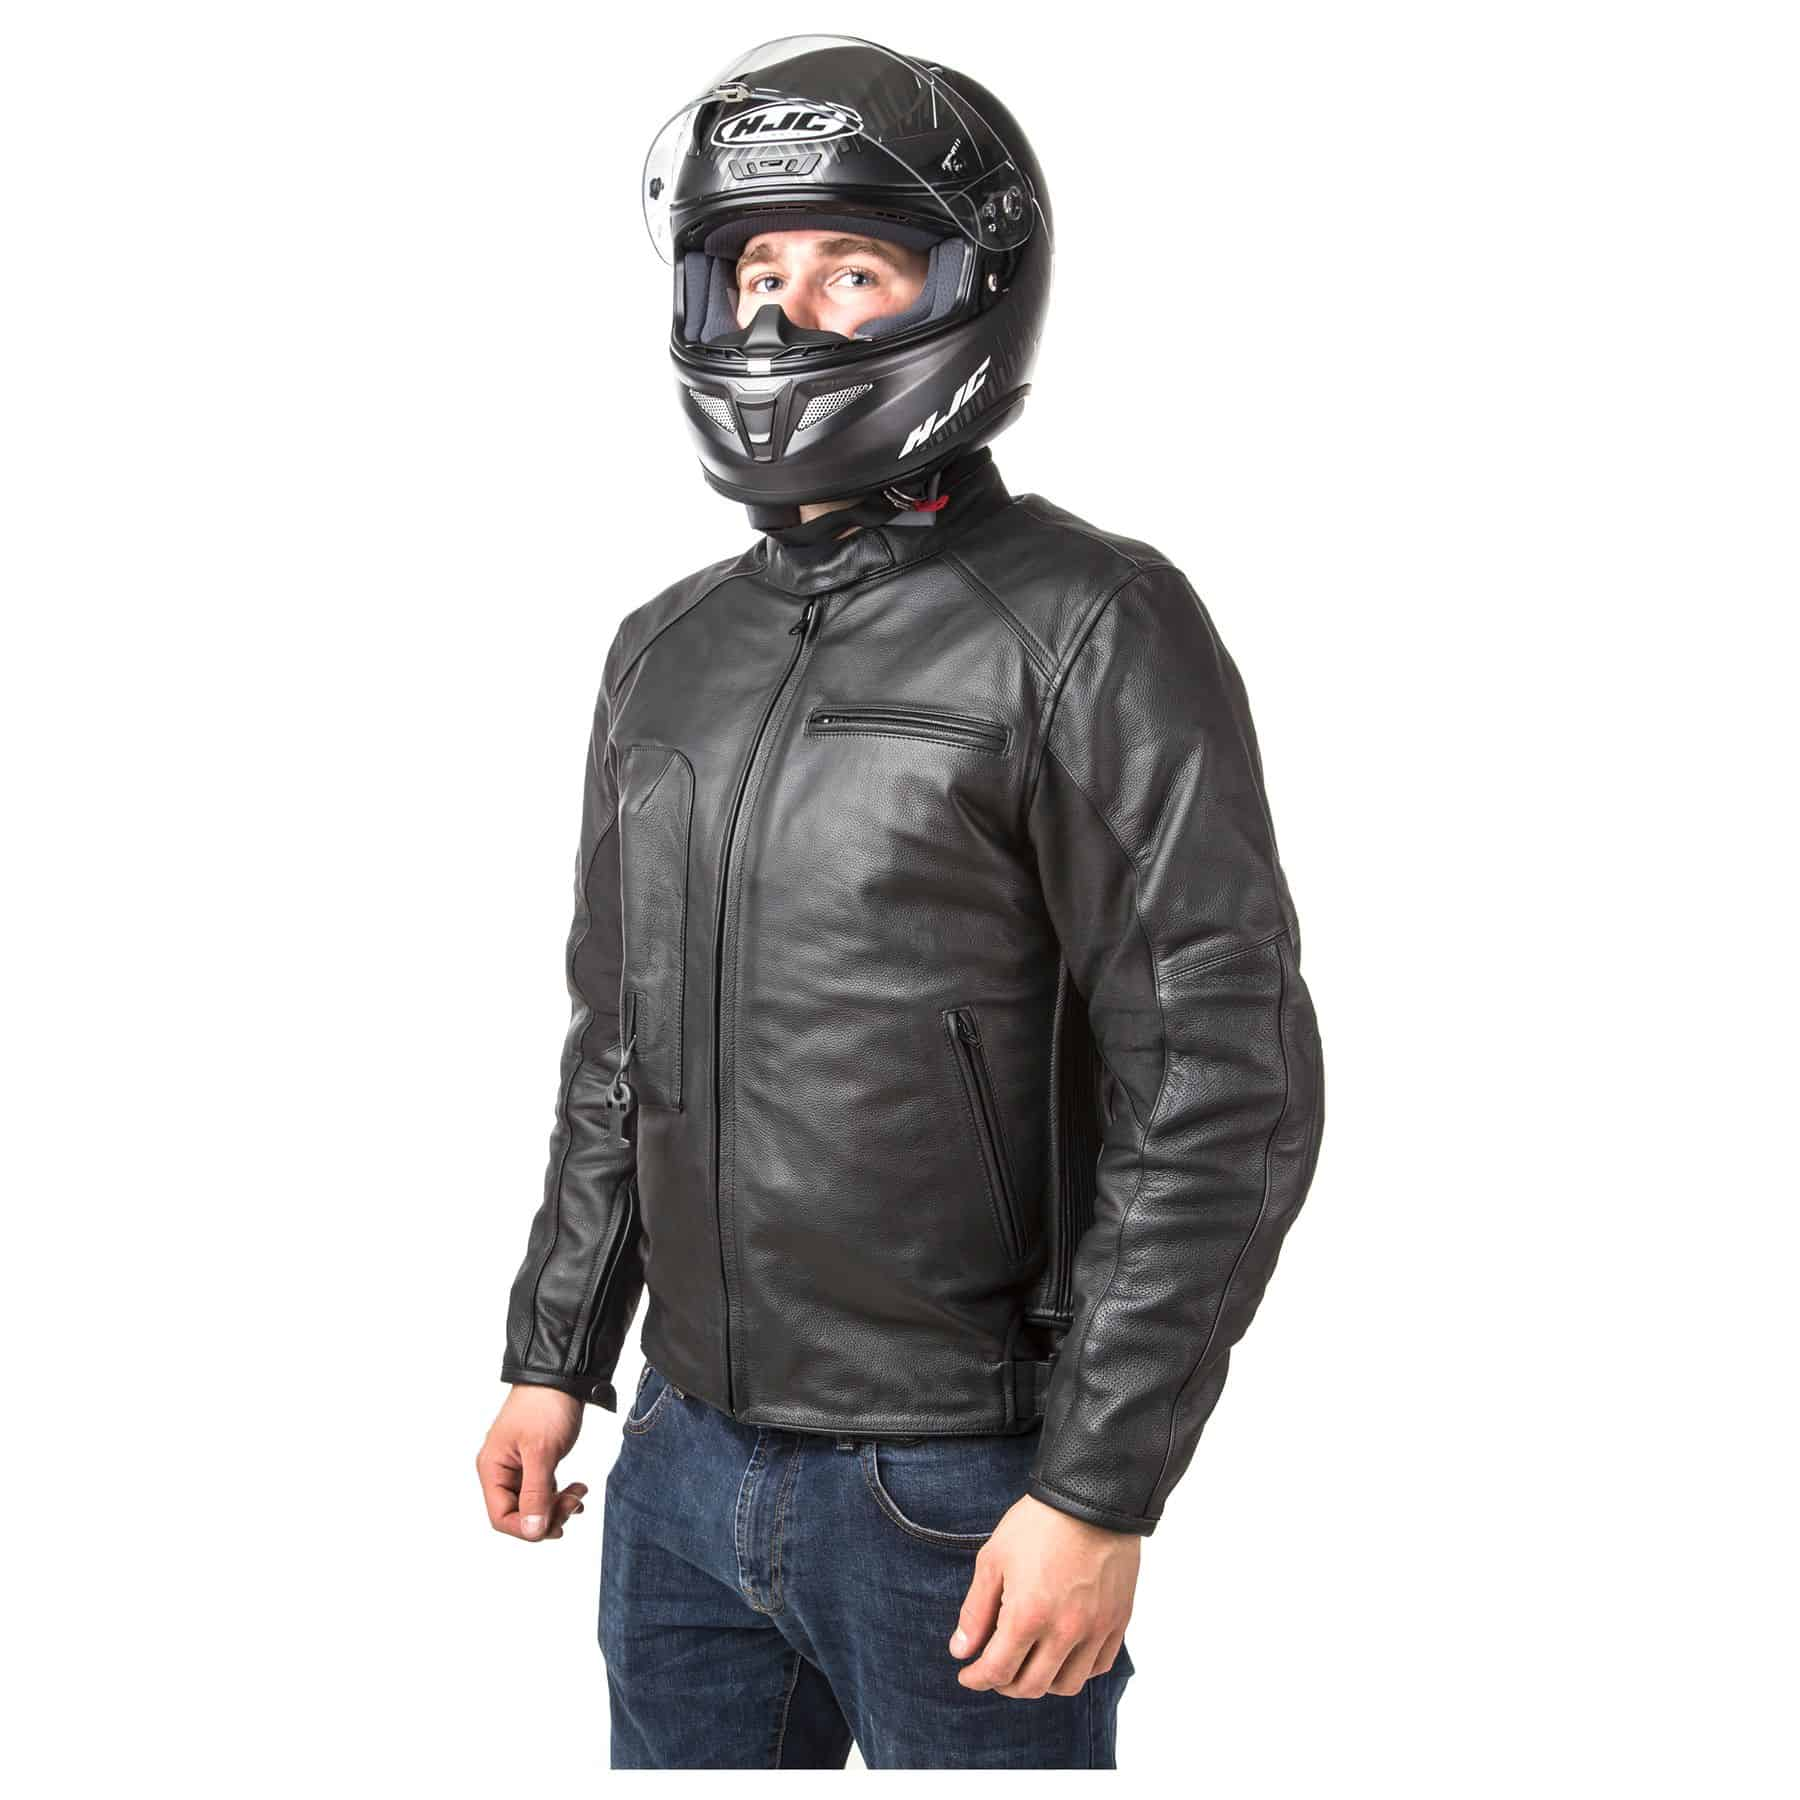 Helite Leather Jacket - Black - Front